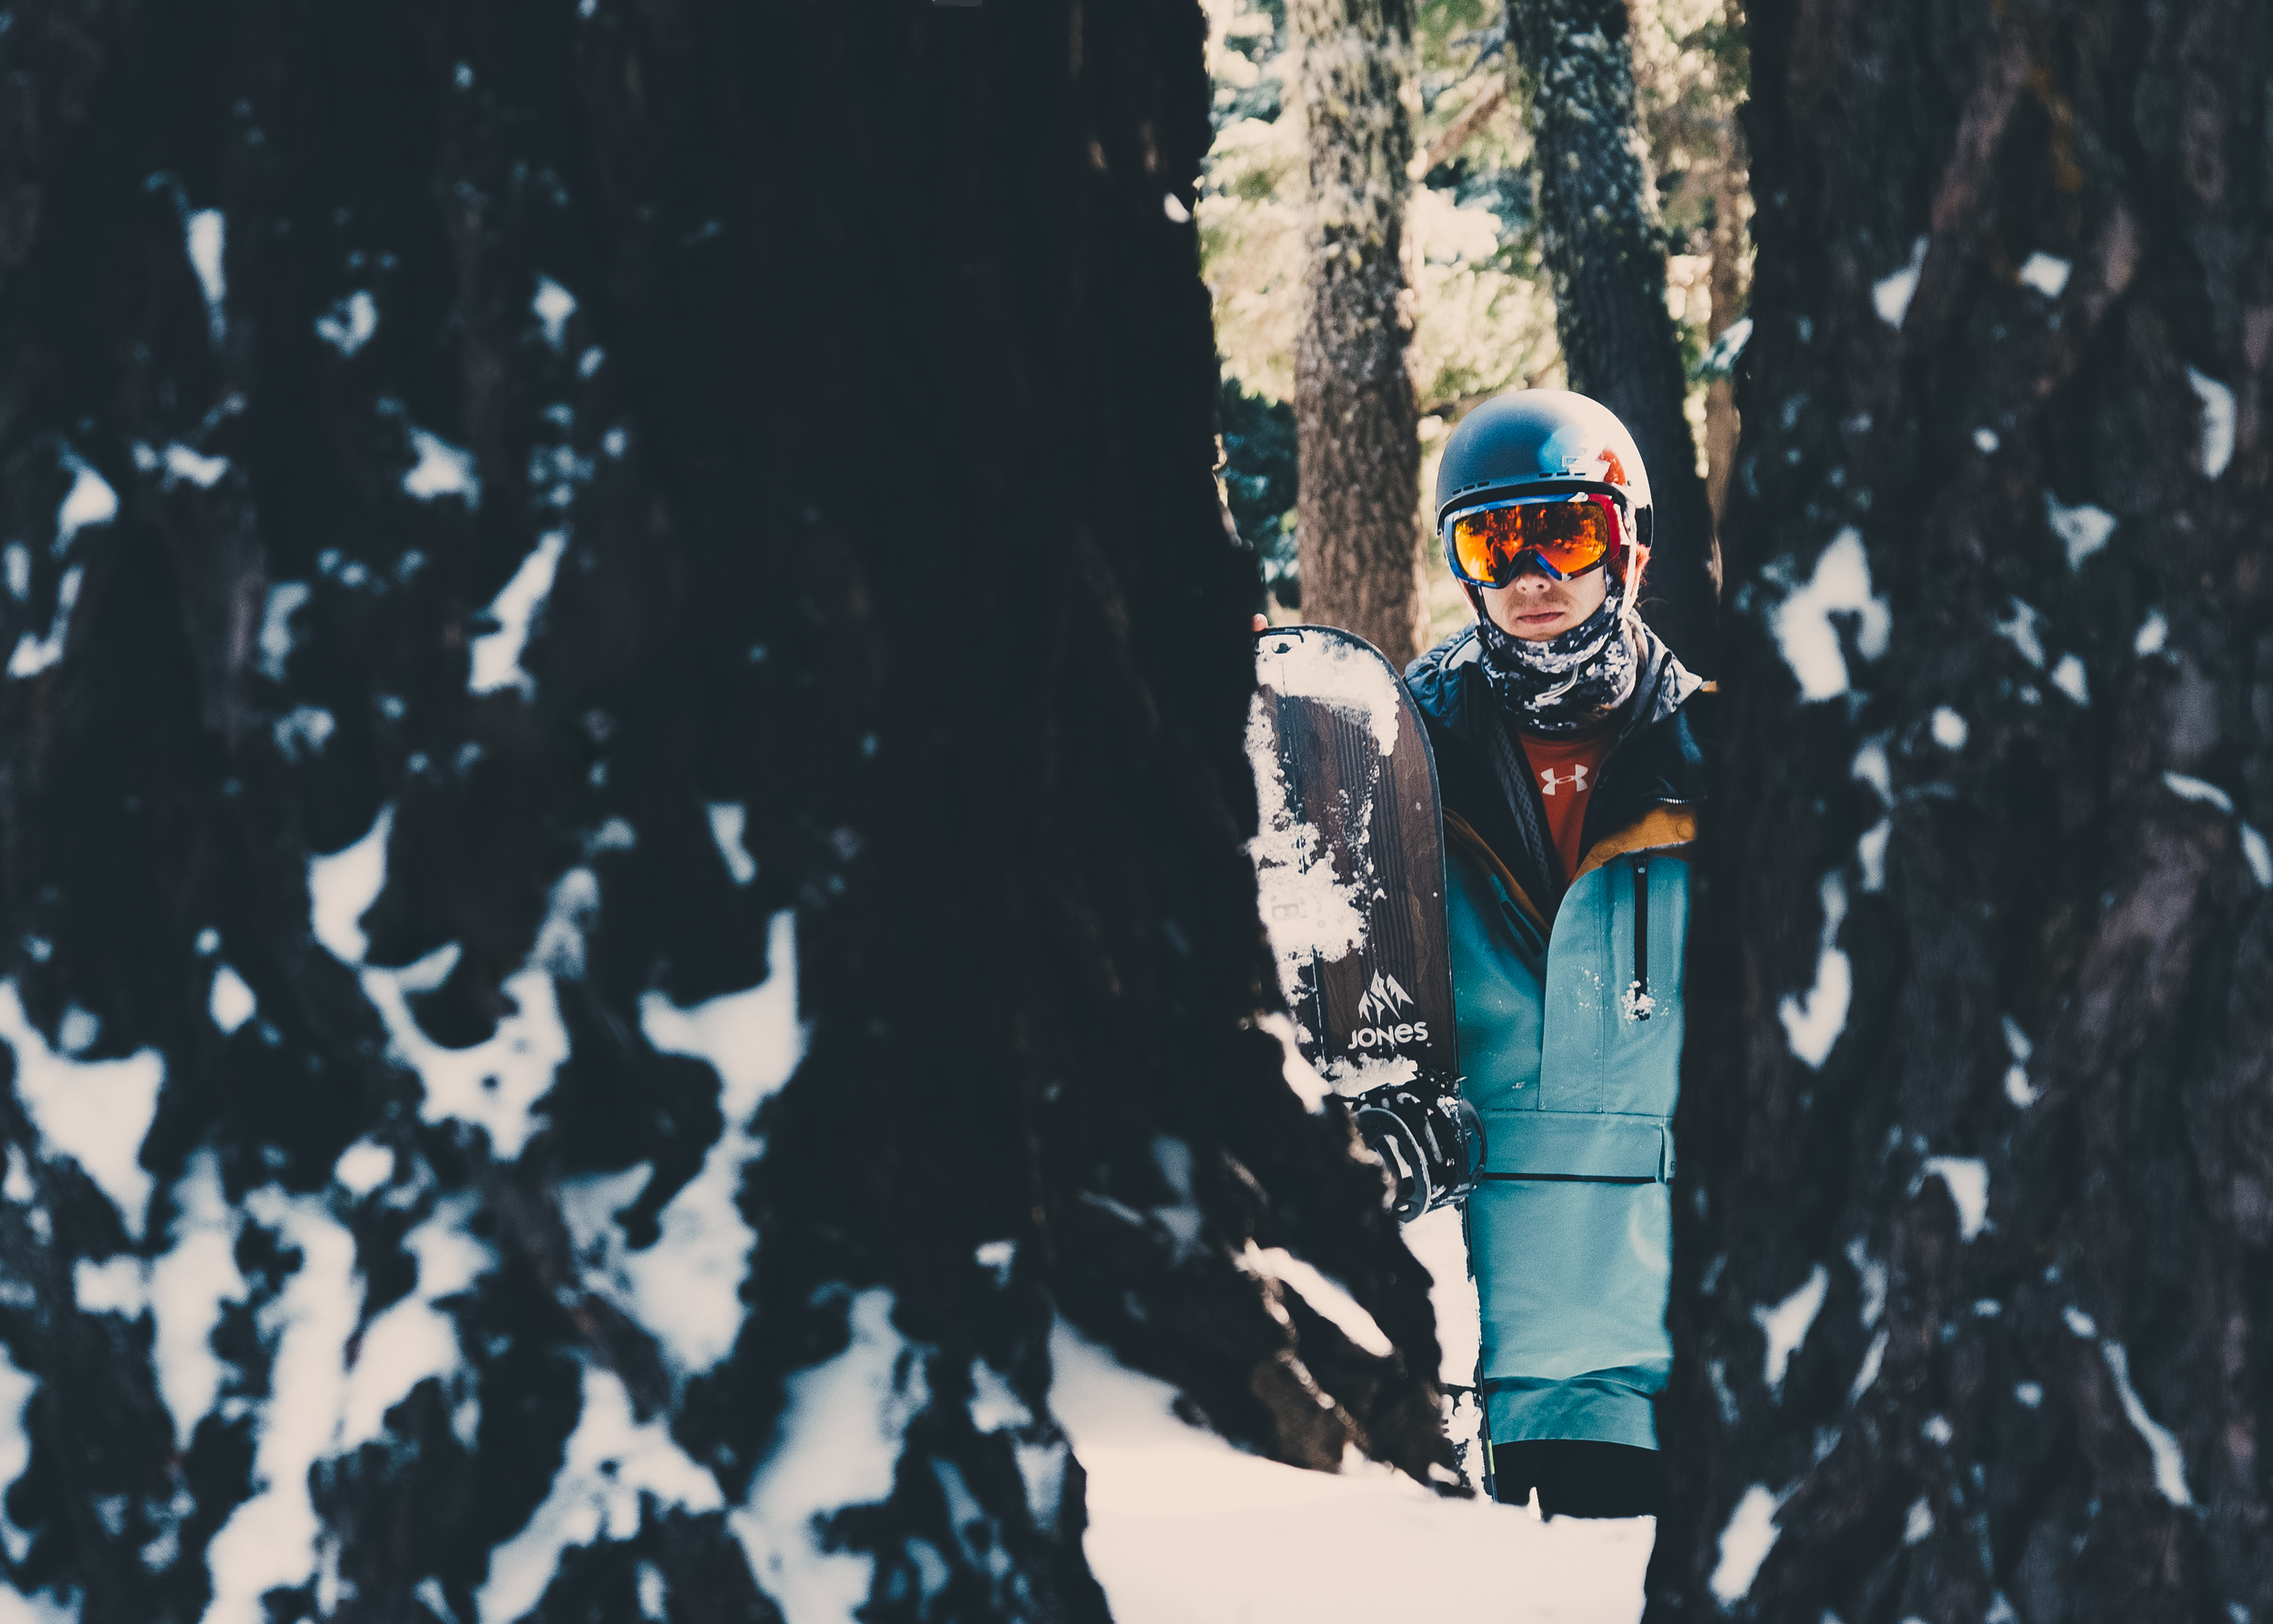 Ben-Armstrong-Tumalo-Mountain-Steve-Aliberti.jpg